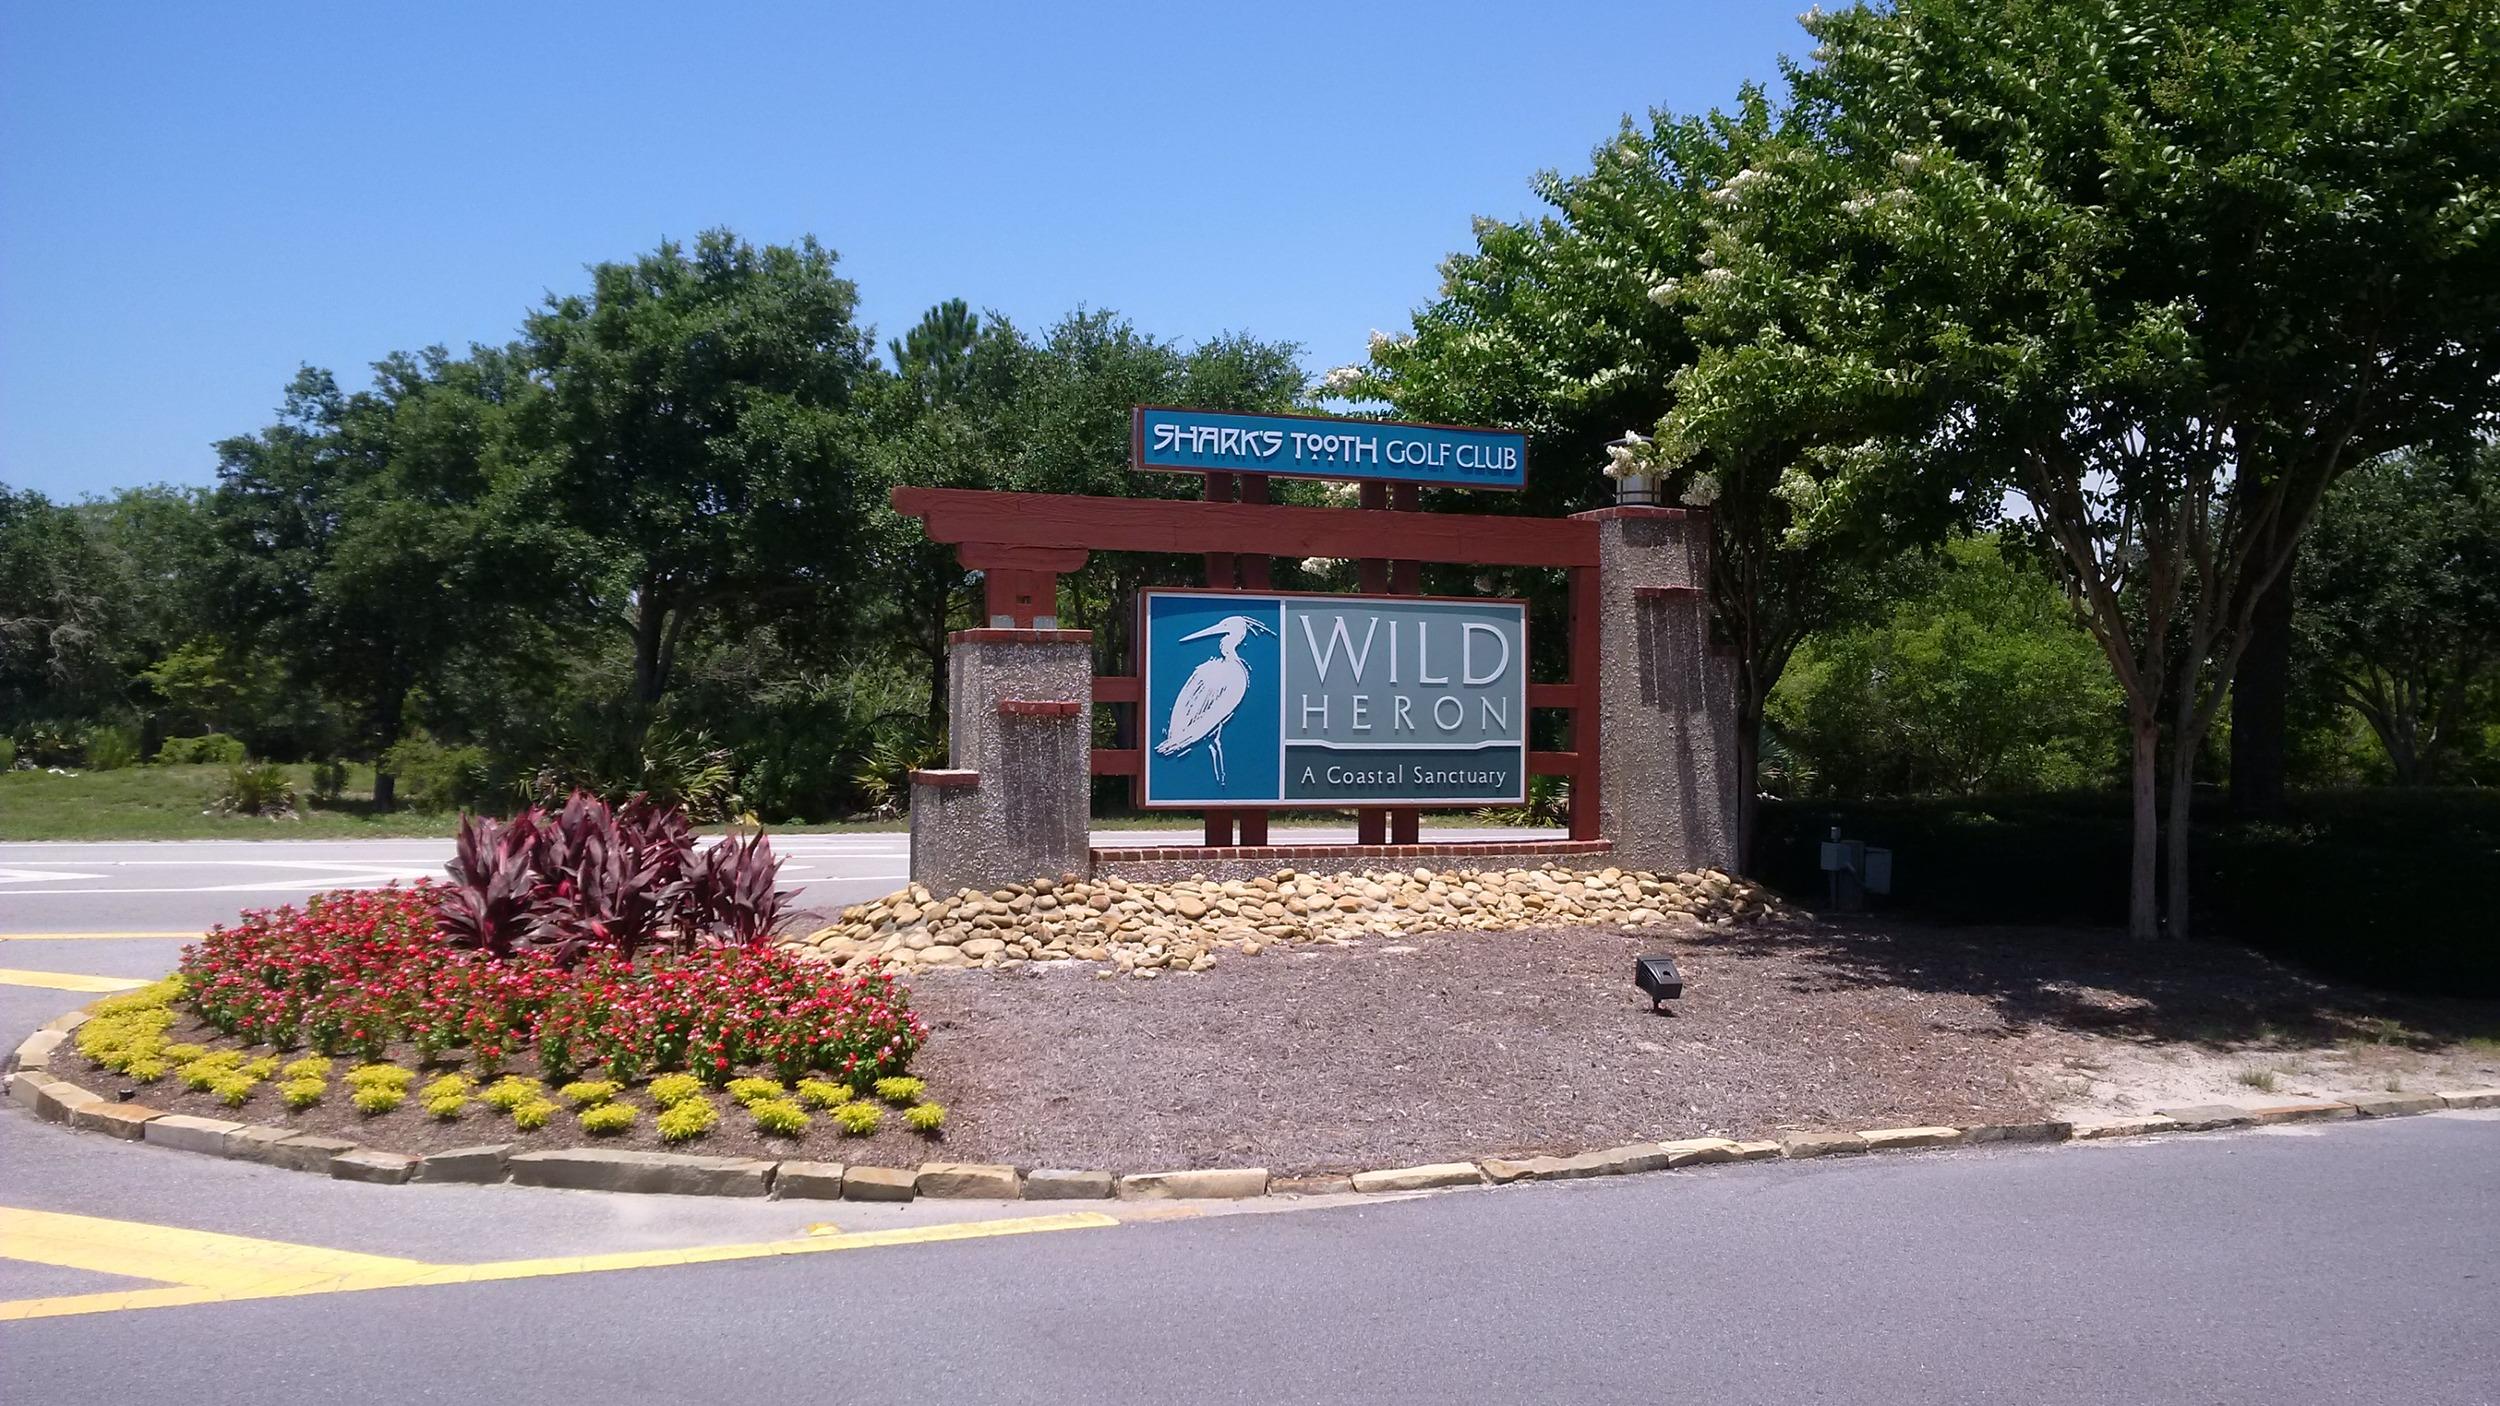 Wild_Heron_Sharks_Tooth.jpg